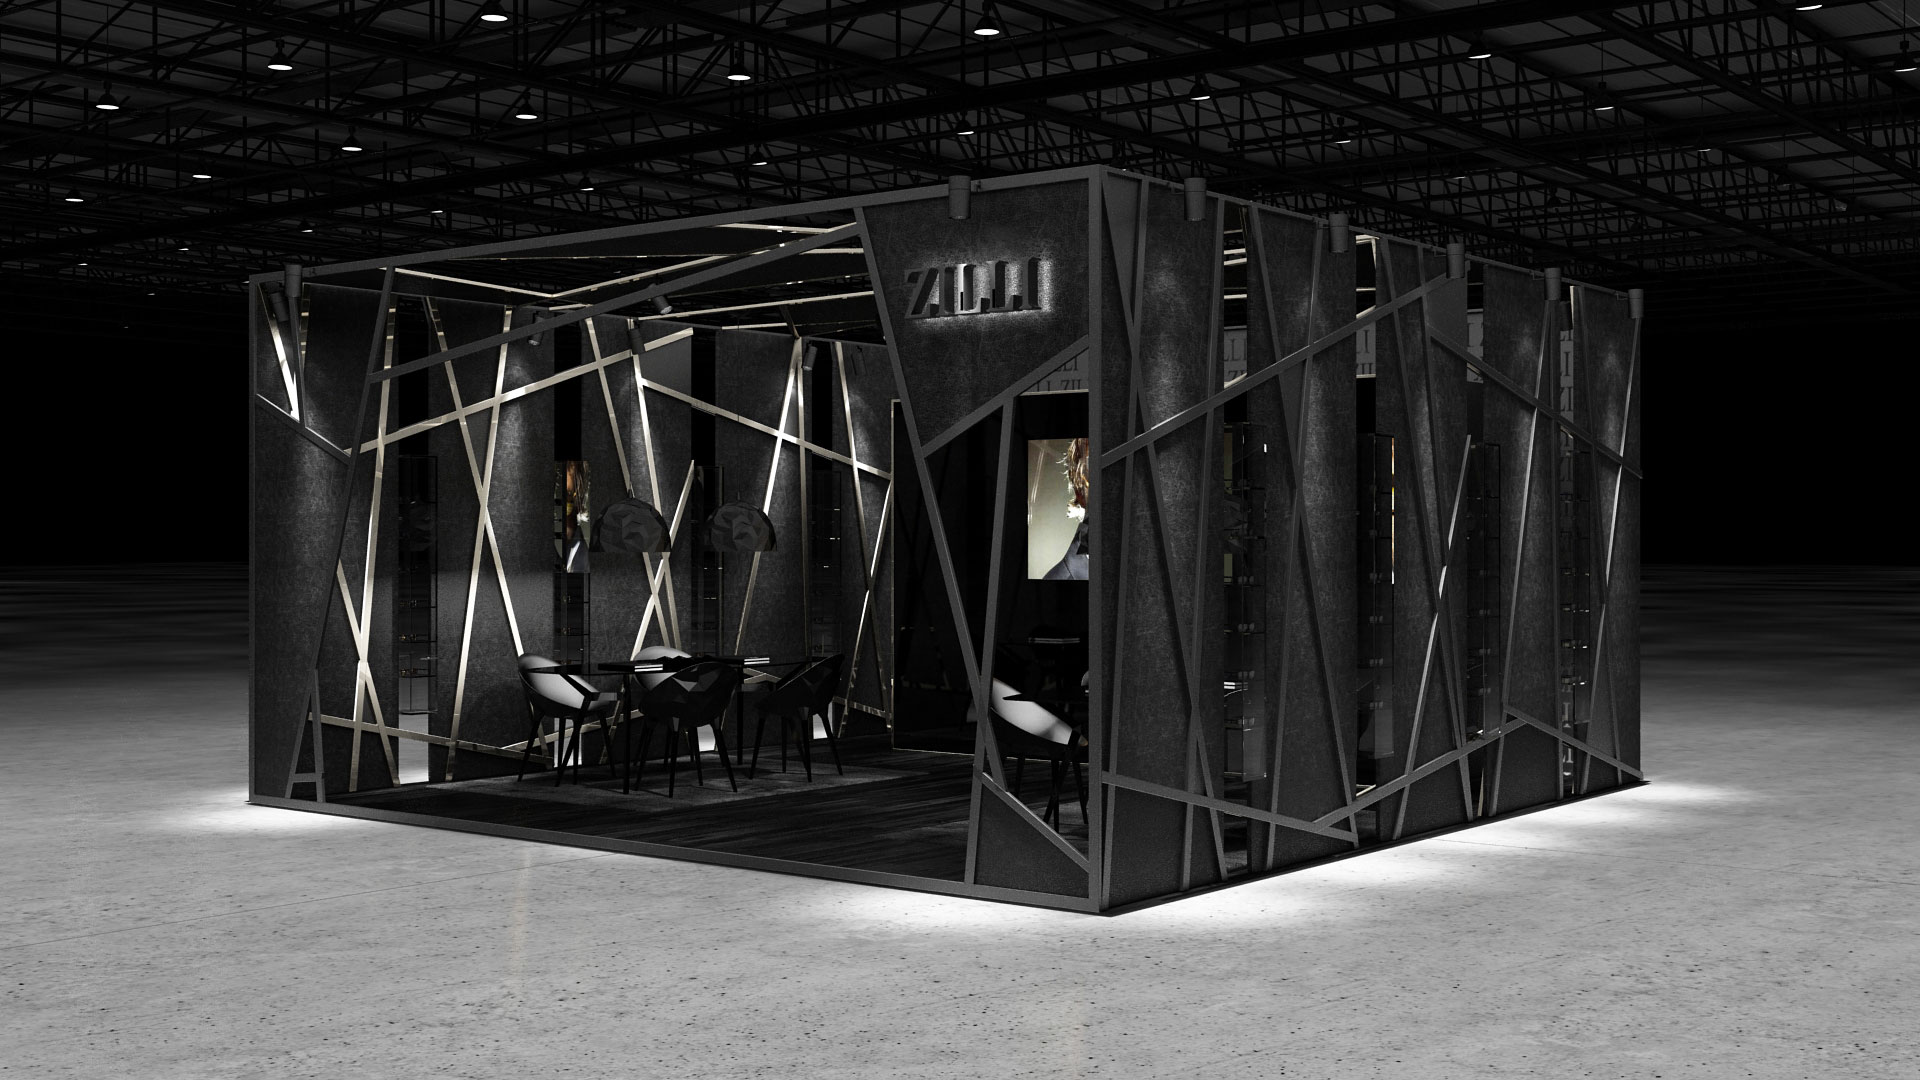 zilli original french designoriginal french design. Black Bedroom Furniture Sets. Home Design Ideas